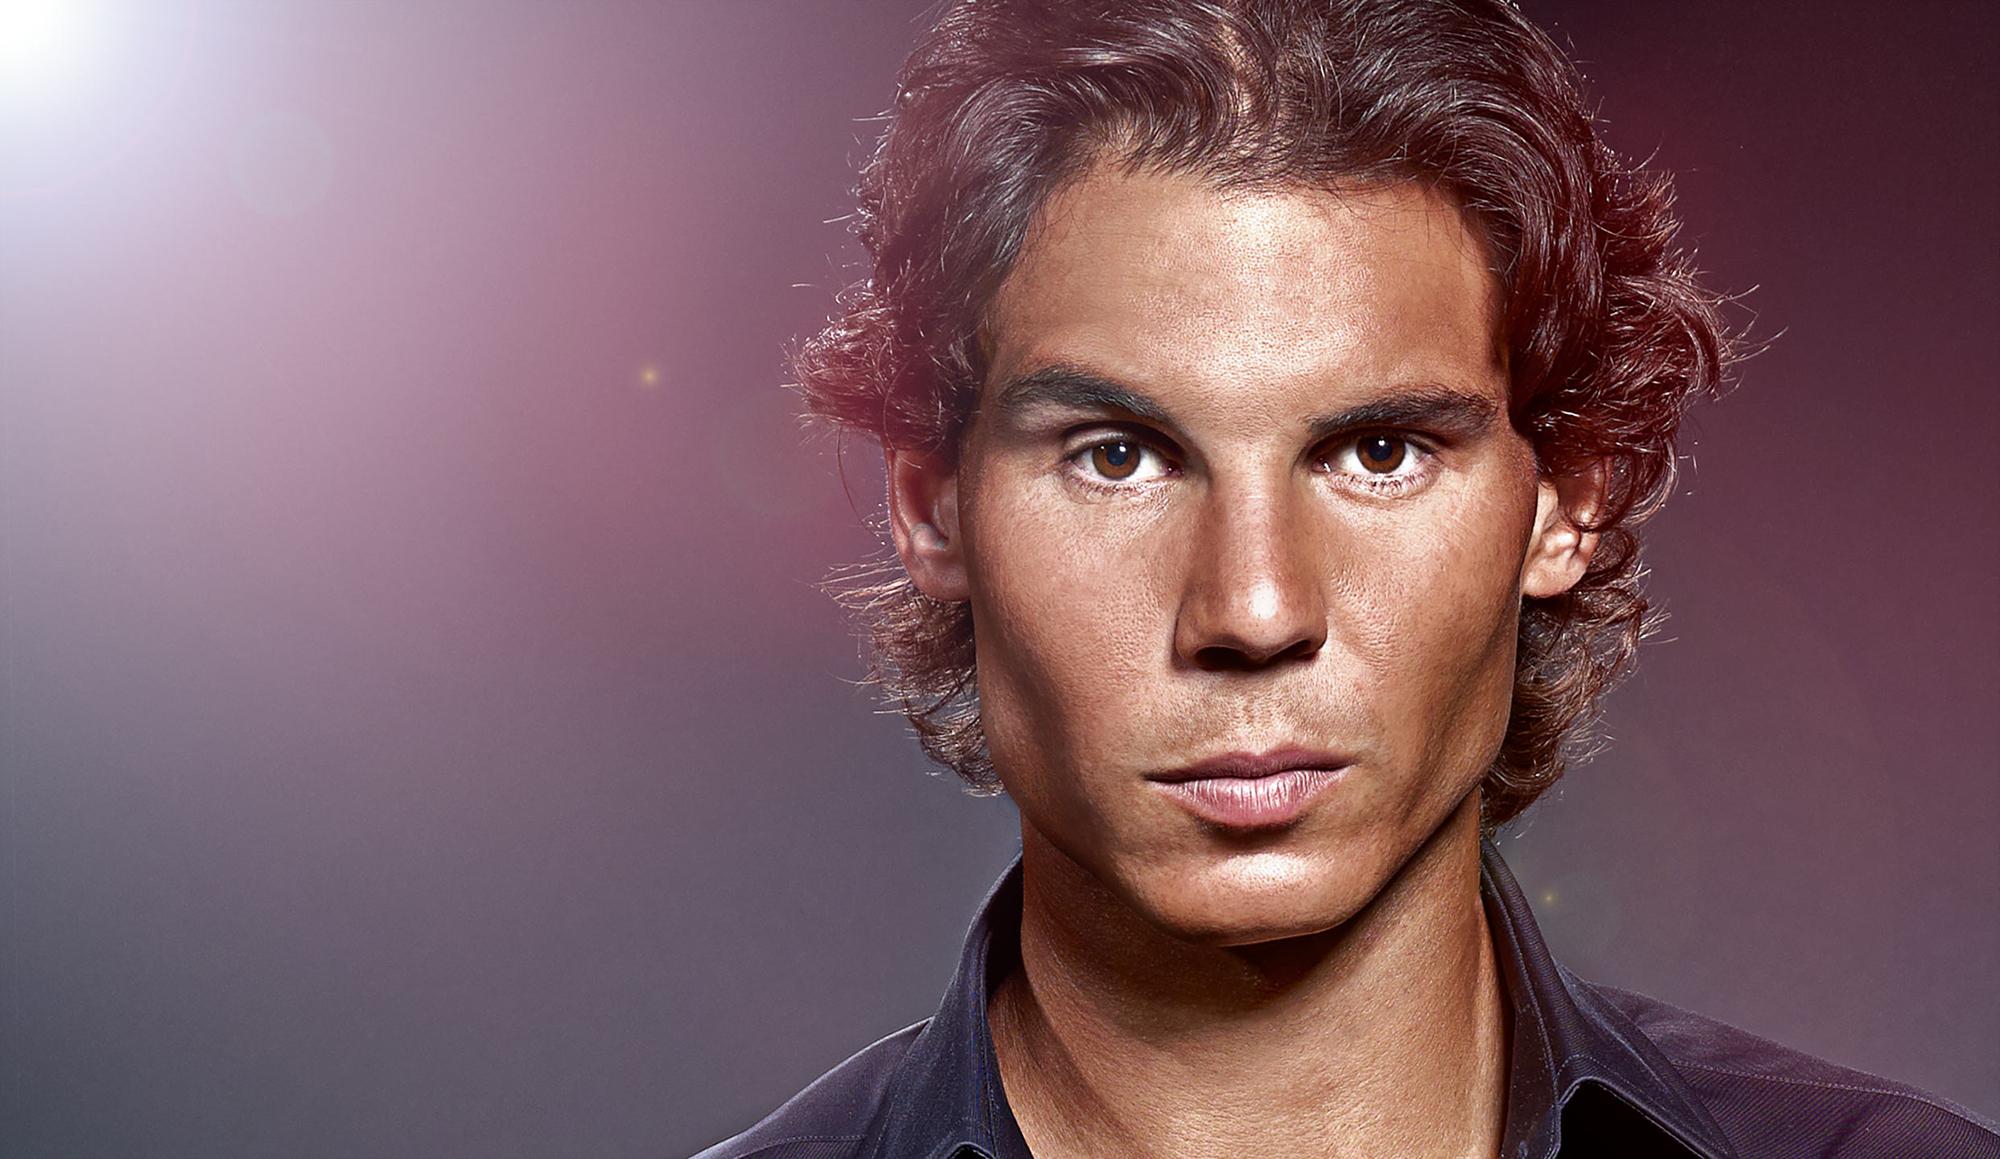 Dean Northcott - Rafael Nadal